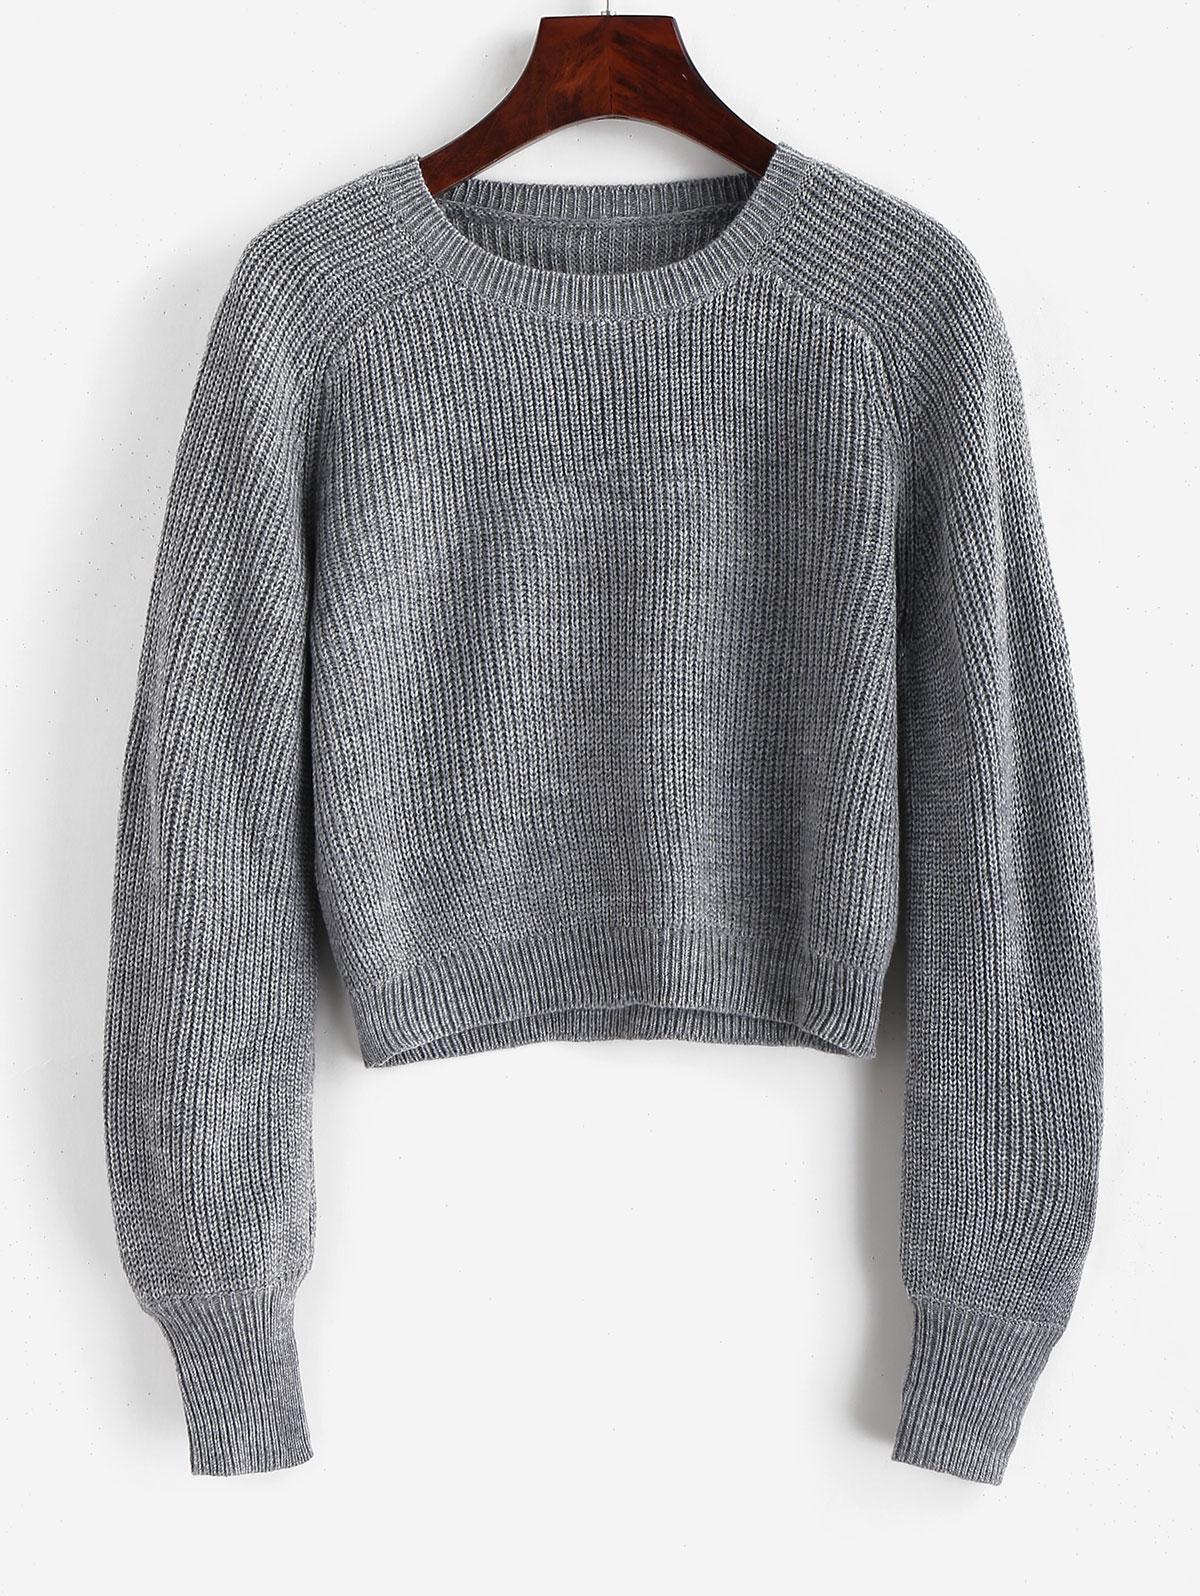 Raglan Sleeve Crew Neck Pullover Sweater, Gray